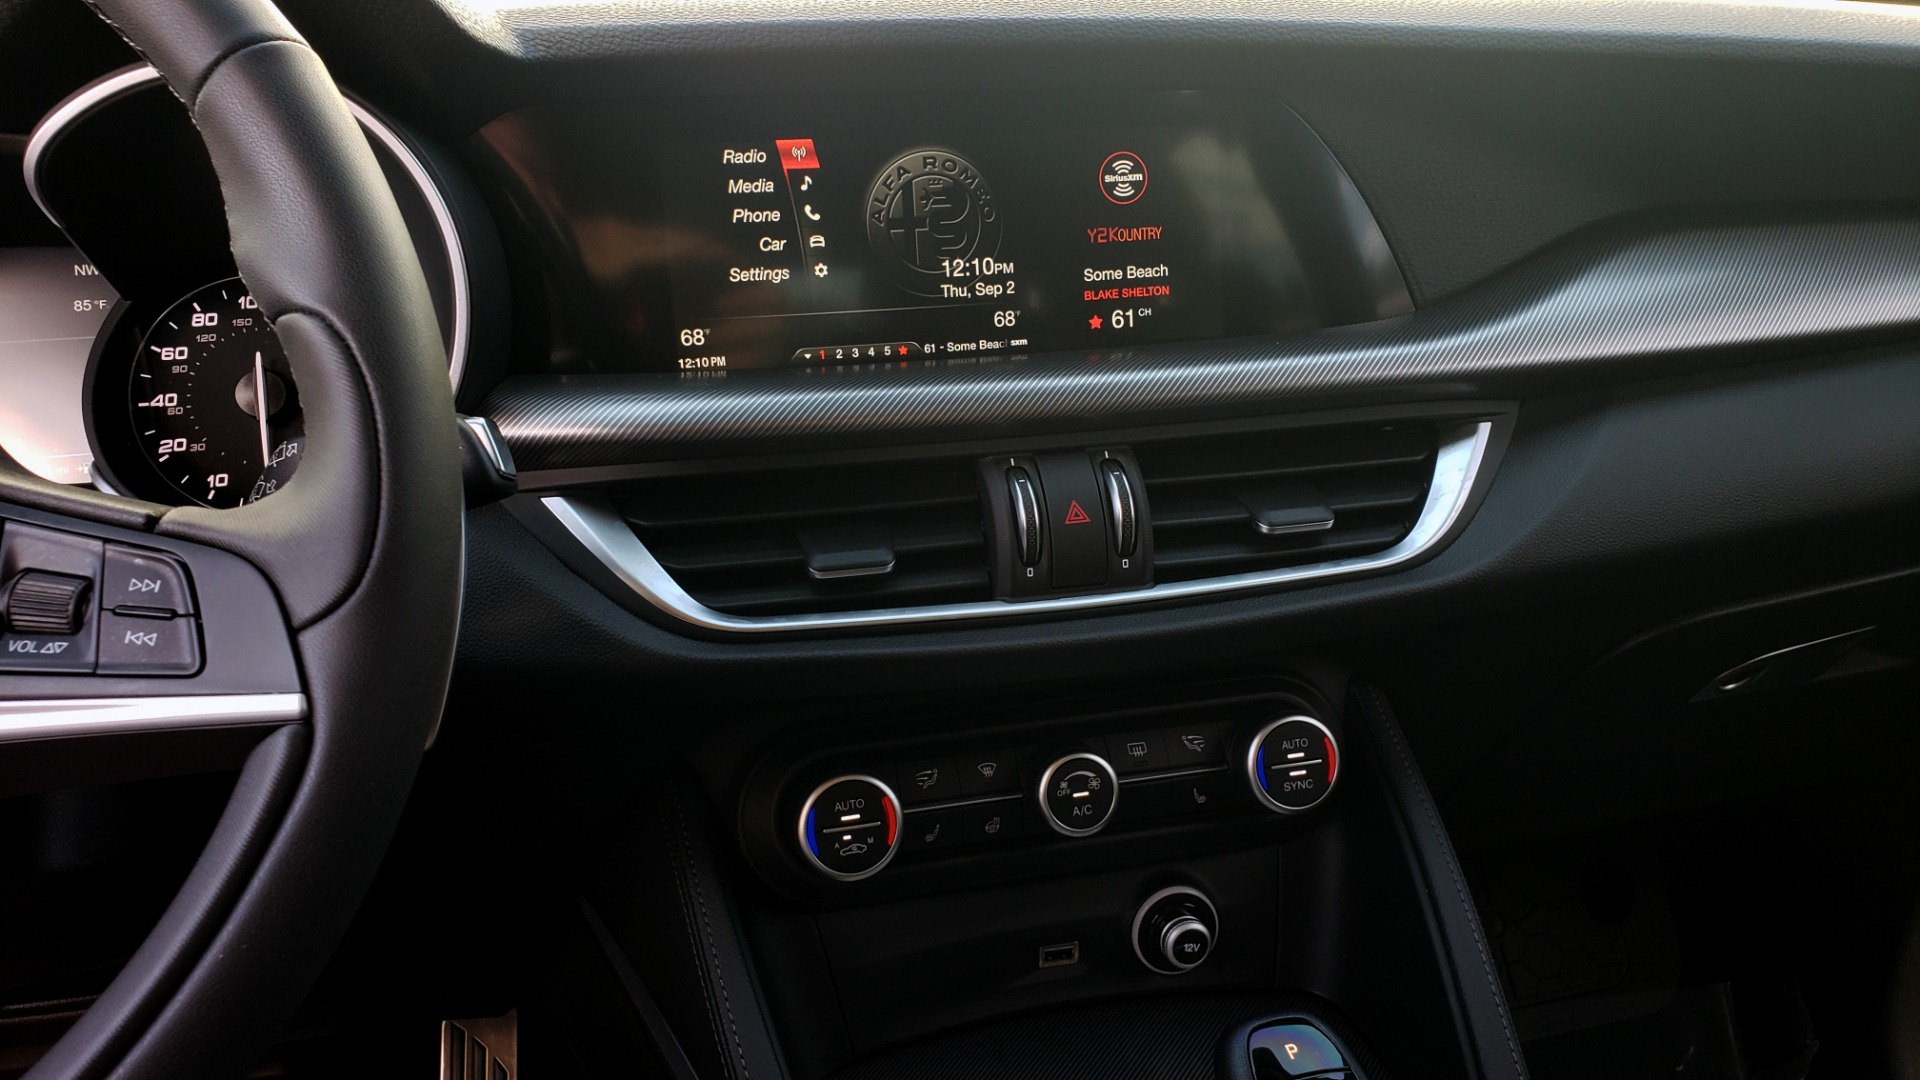 Used 2019 Alfa Romeo STELVIO TI SPORT AWD / 2.0L TURBO / 8-SPD AUTO / DRVR ASST / REARVIEW for sale $37,495 at Formula Imports in Charlotte NC 28227 50